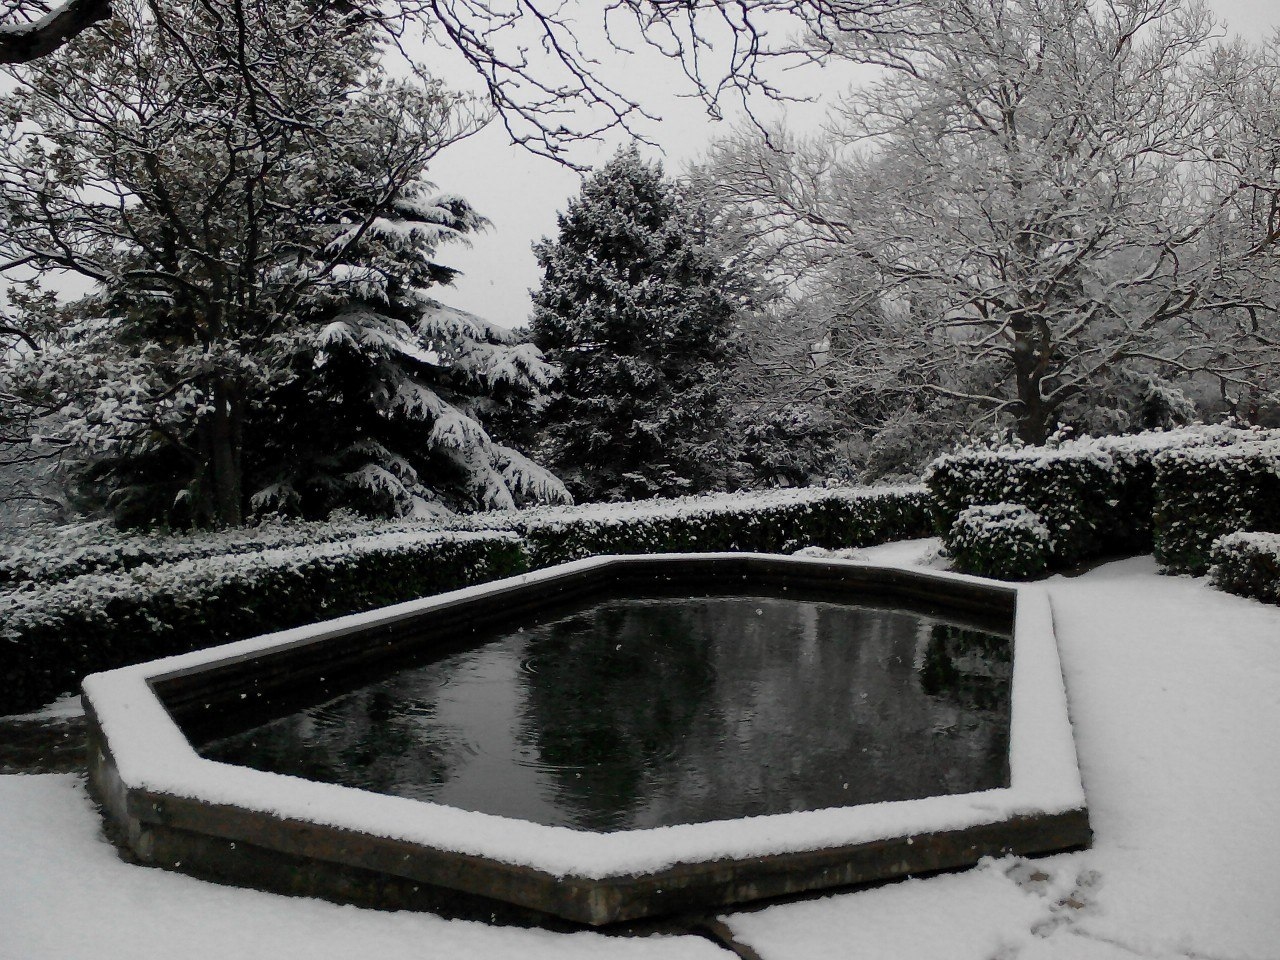 Фото Алупки зимой: Воронцовский дворец и парк в снегу